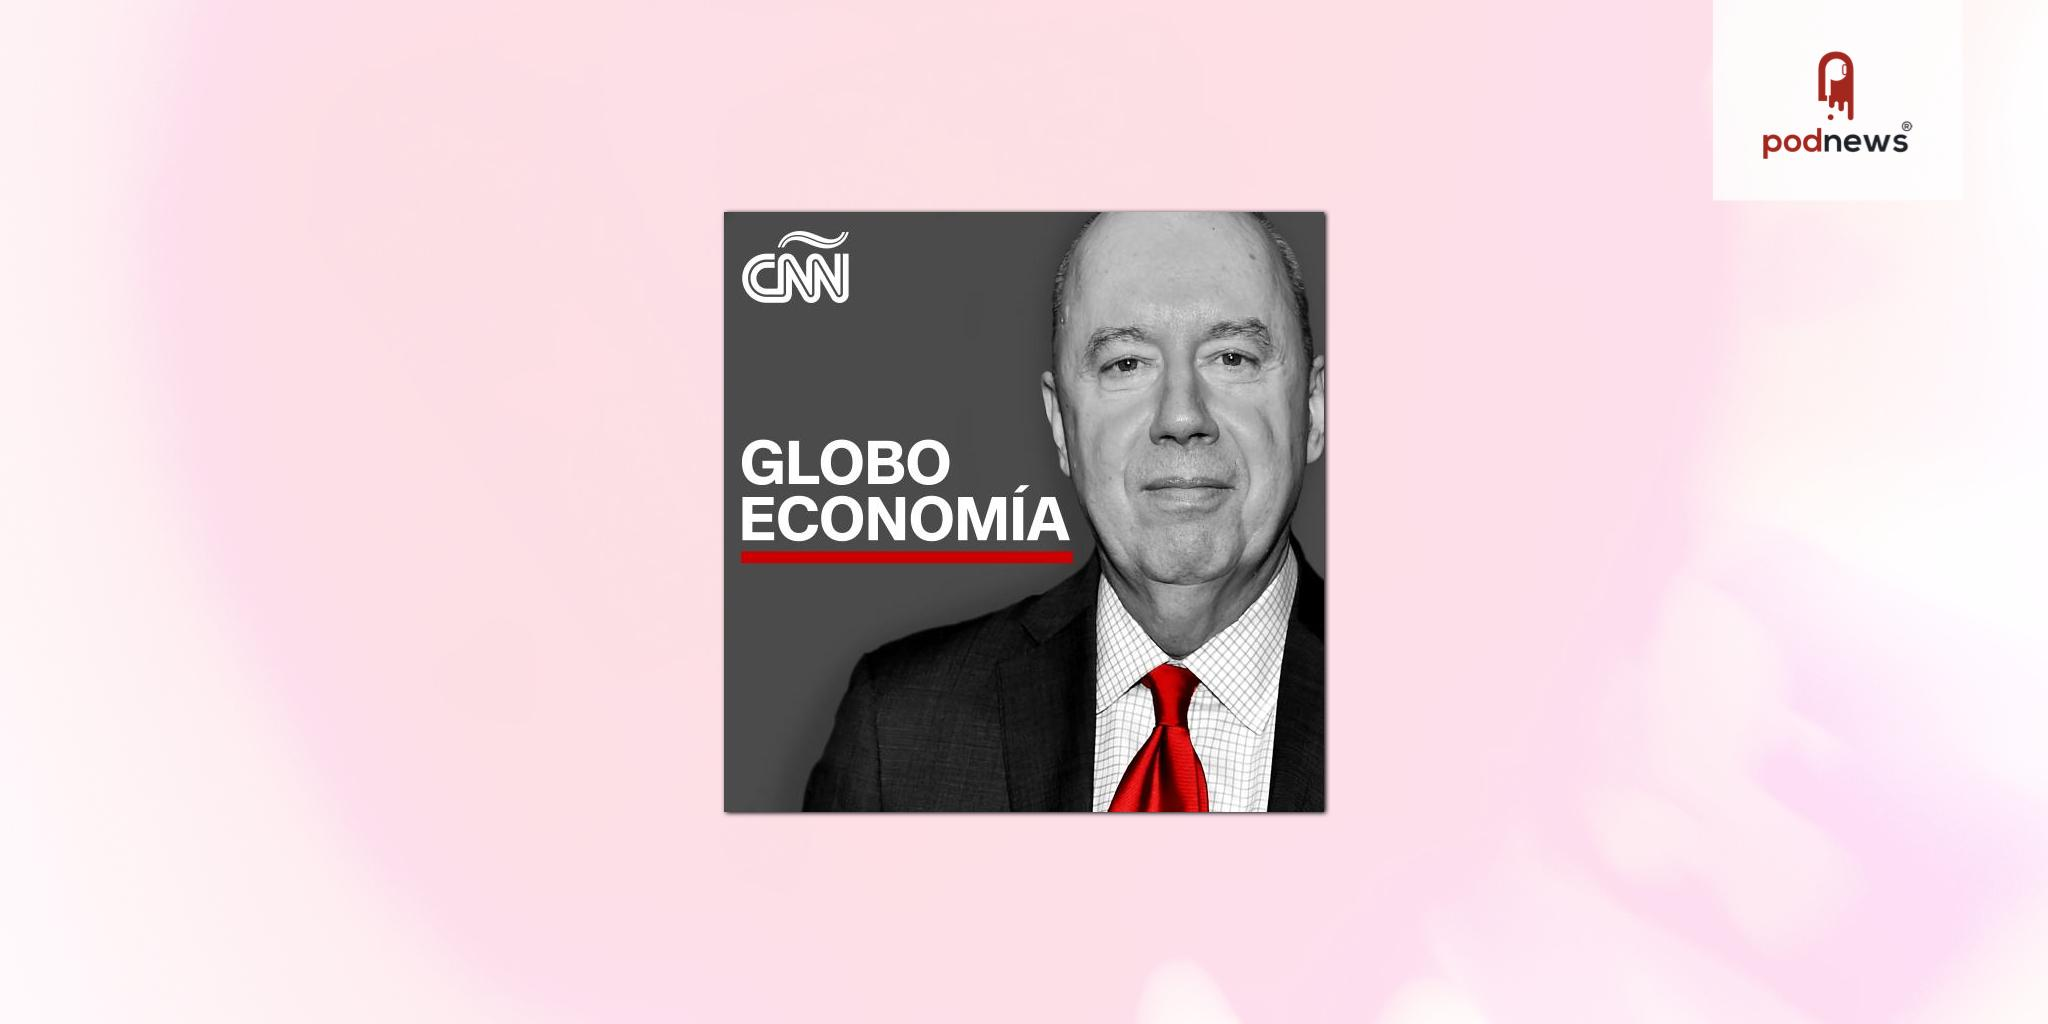 CNN en Español's Podcast roster adds GloboEconomia